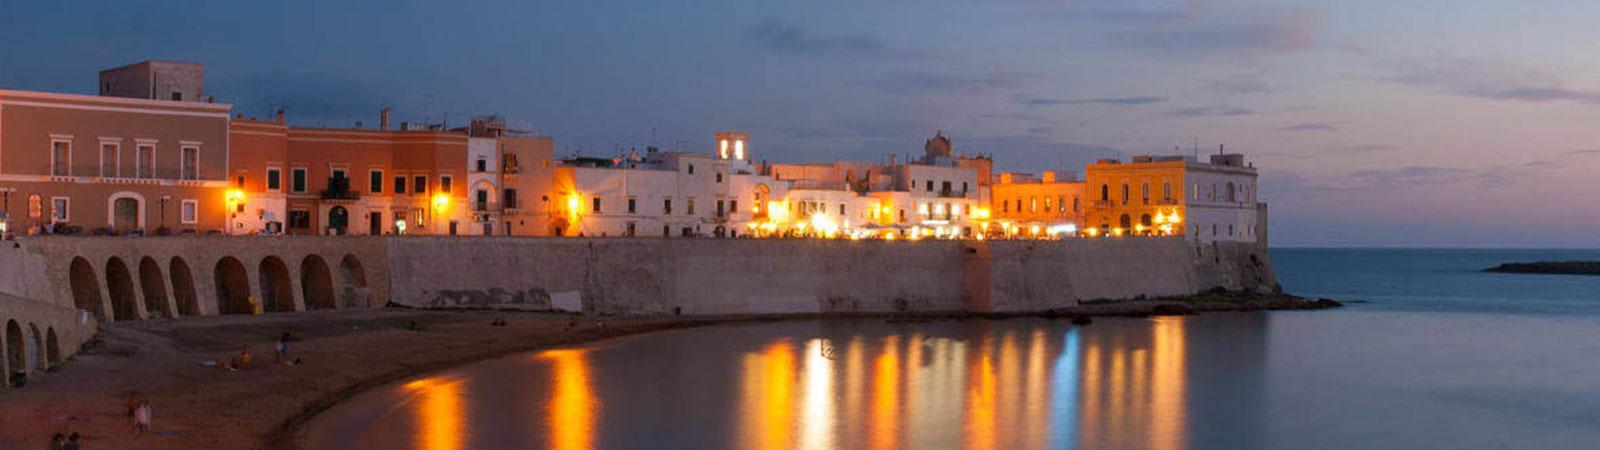 Night a Gallipoli - Vacanze a Gallipoli - Salento